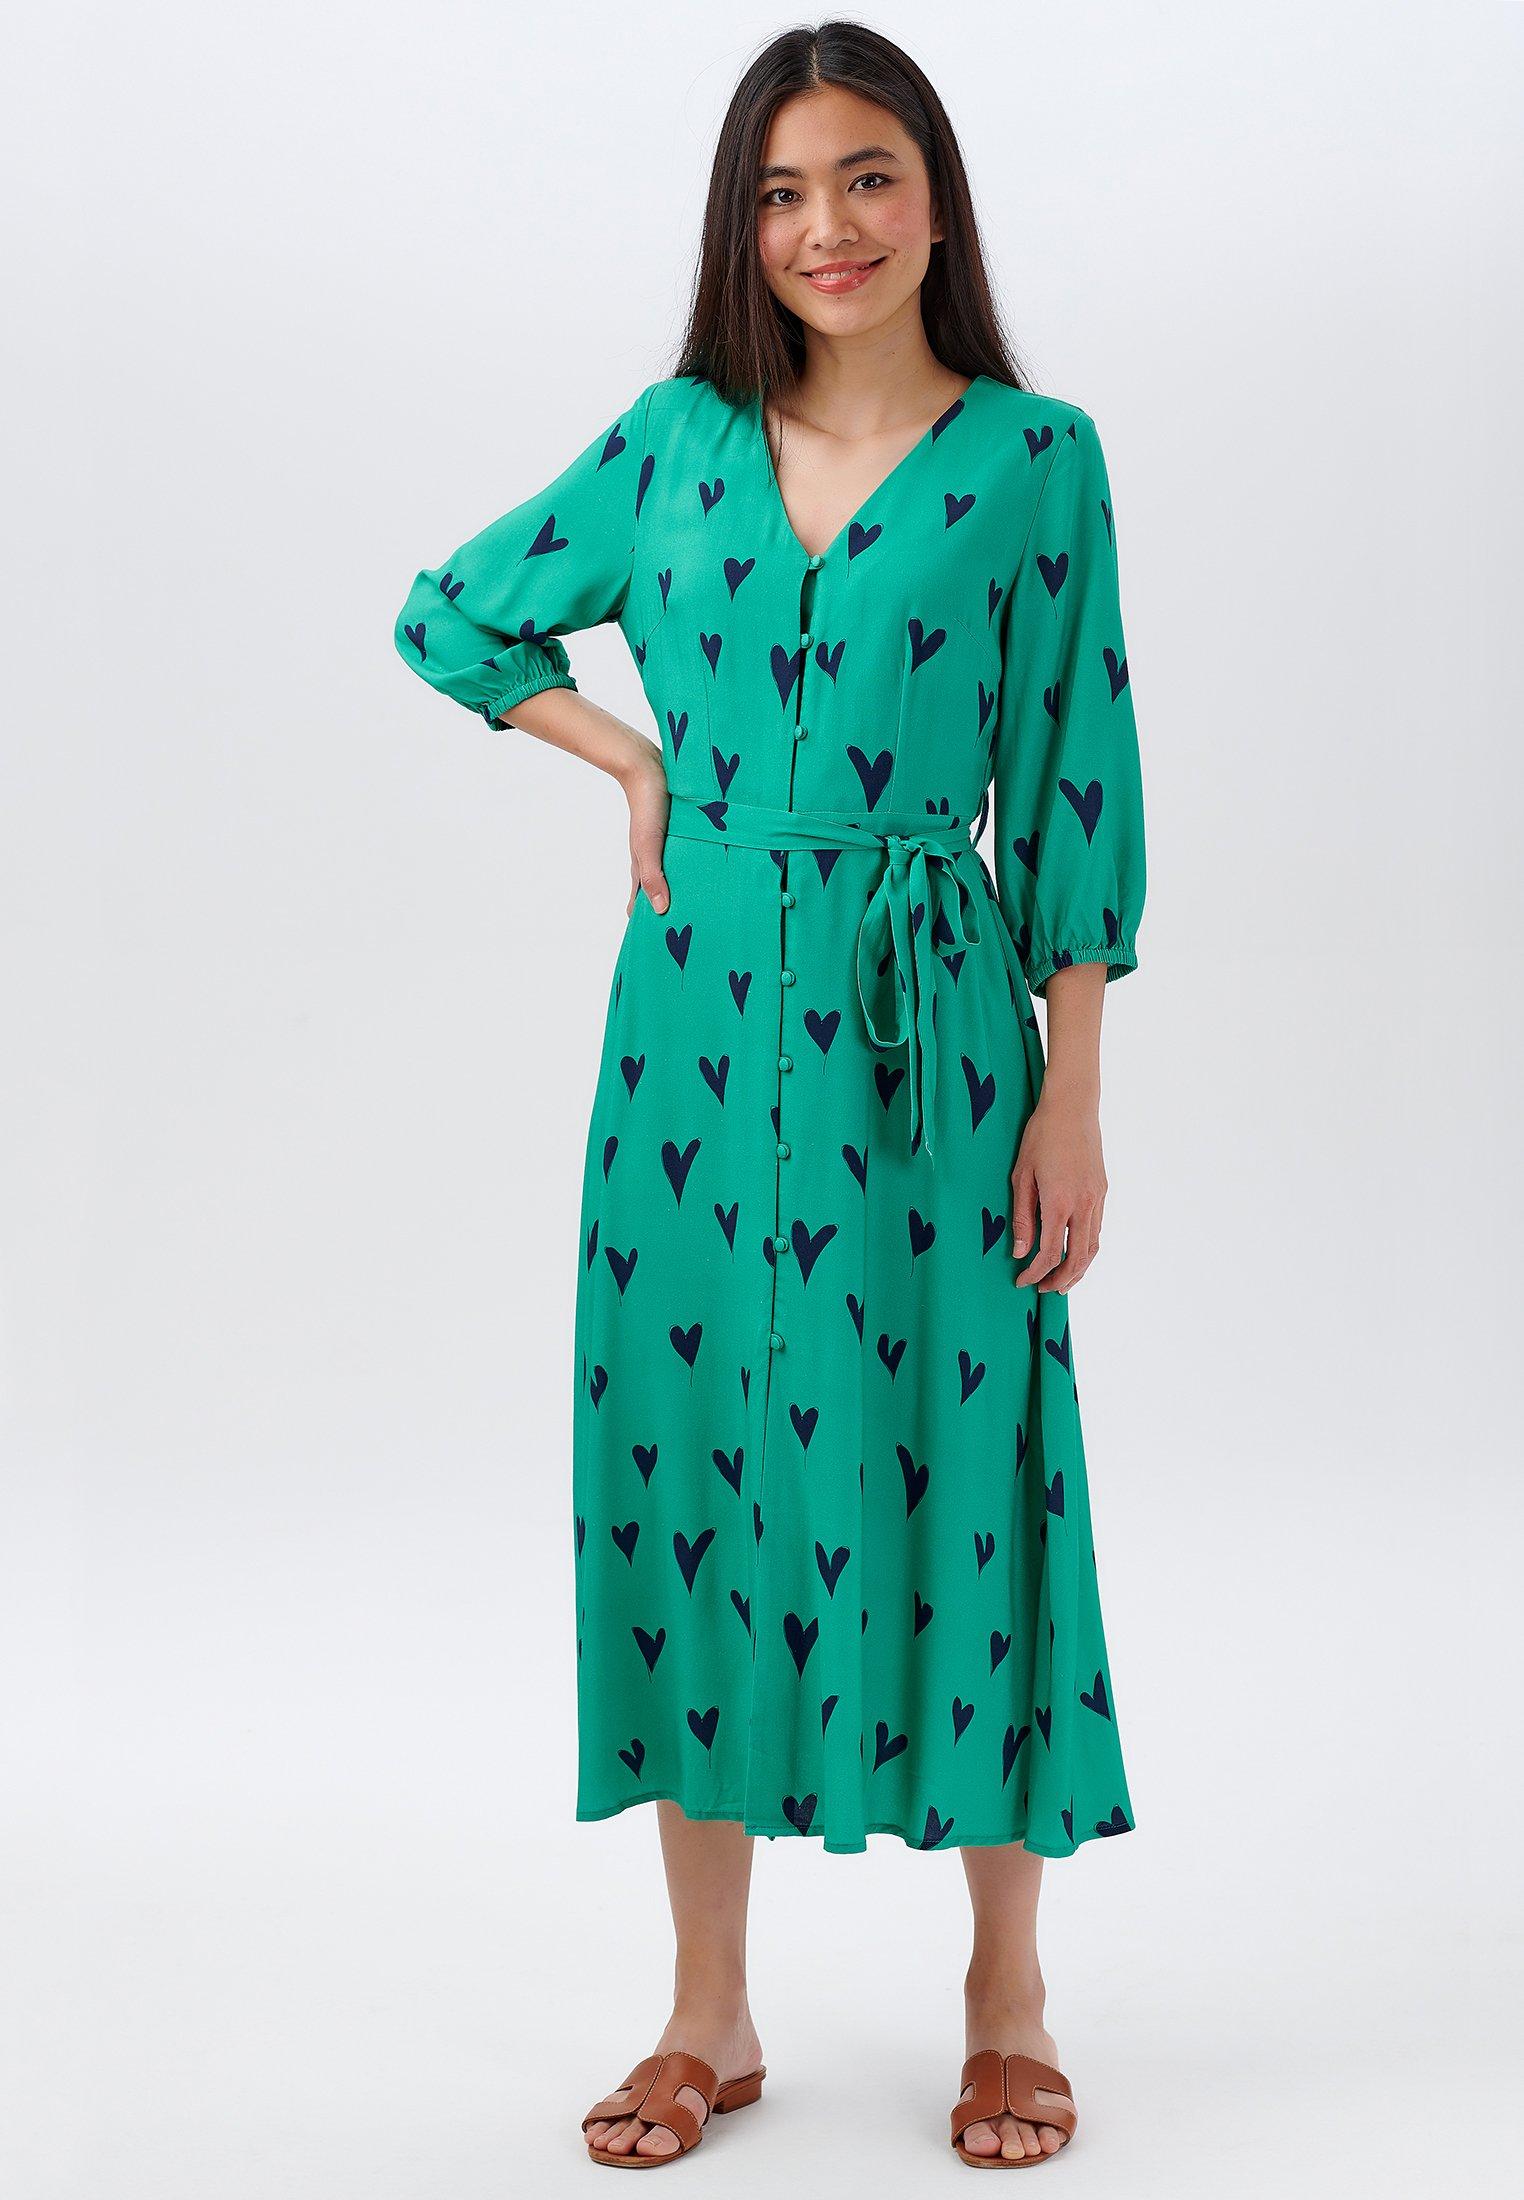 Femme COURTNEY HEARTS - Robe d'été